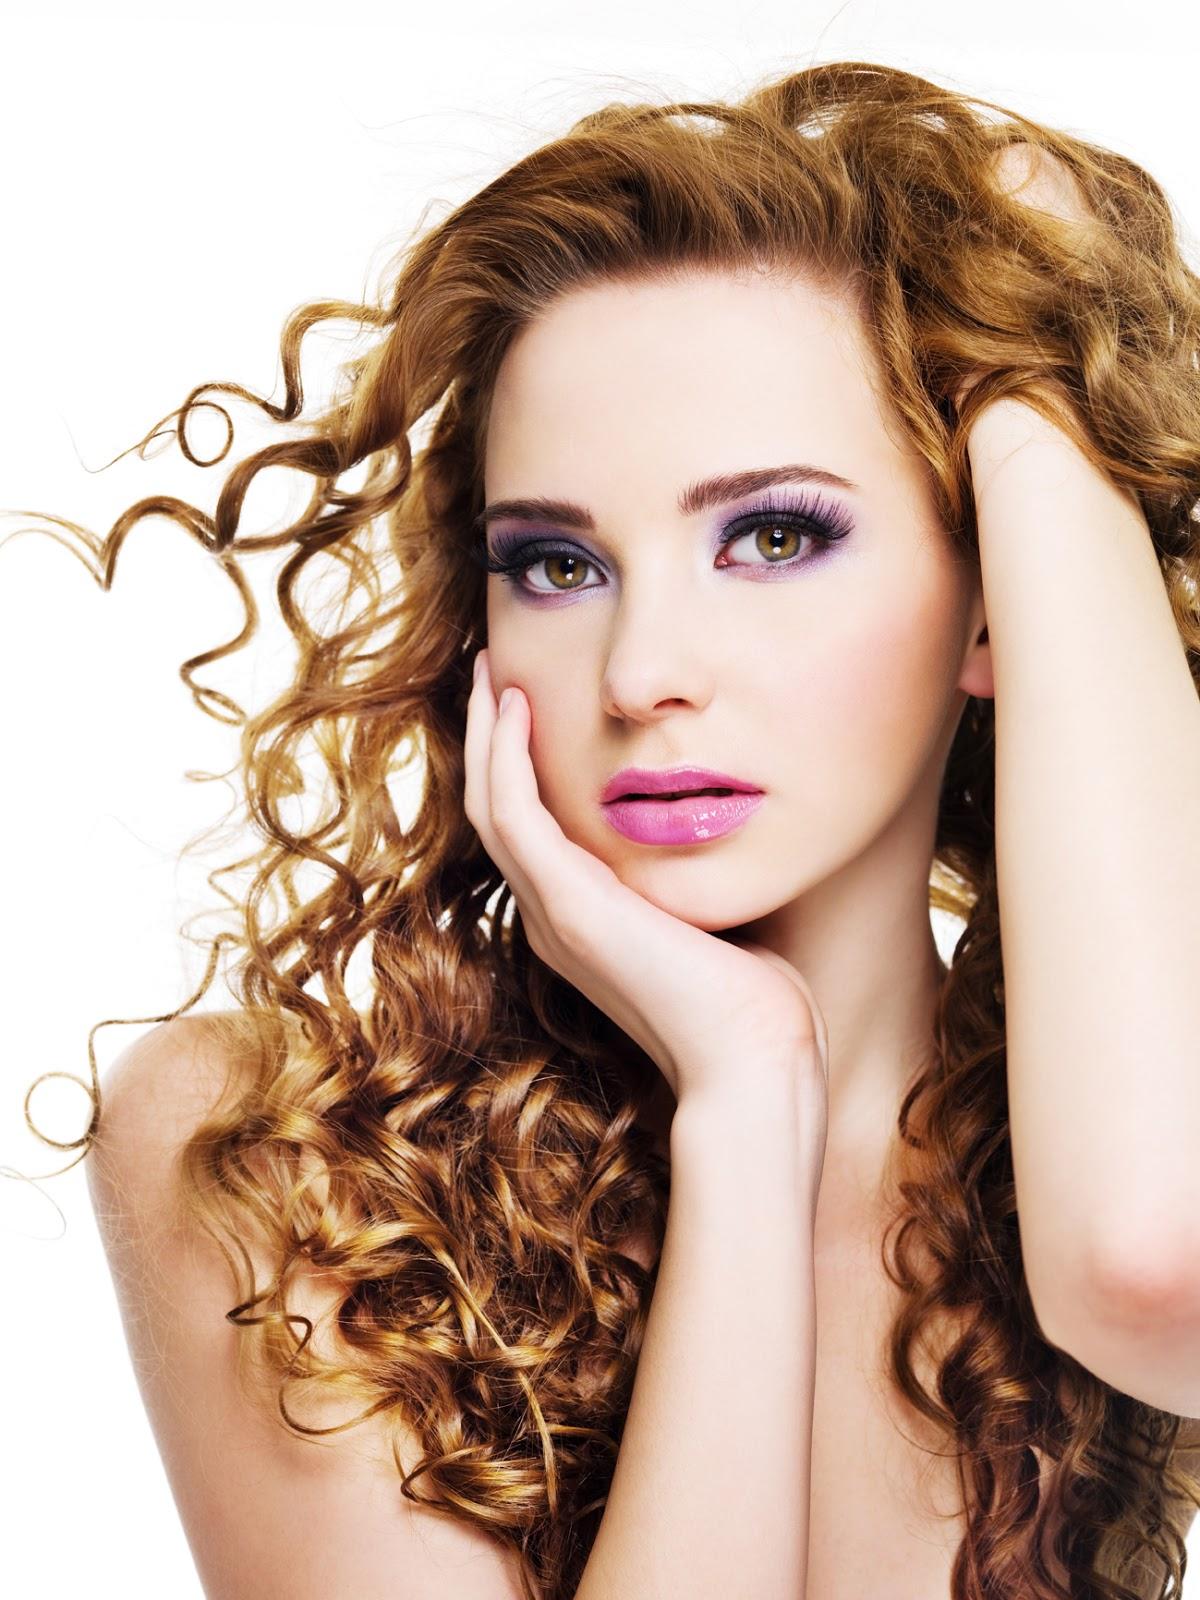 Peinados y moda lindos peinados rizados para mujeres sexys - Peinados bonitos para ninas ...